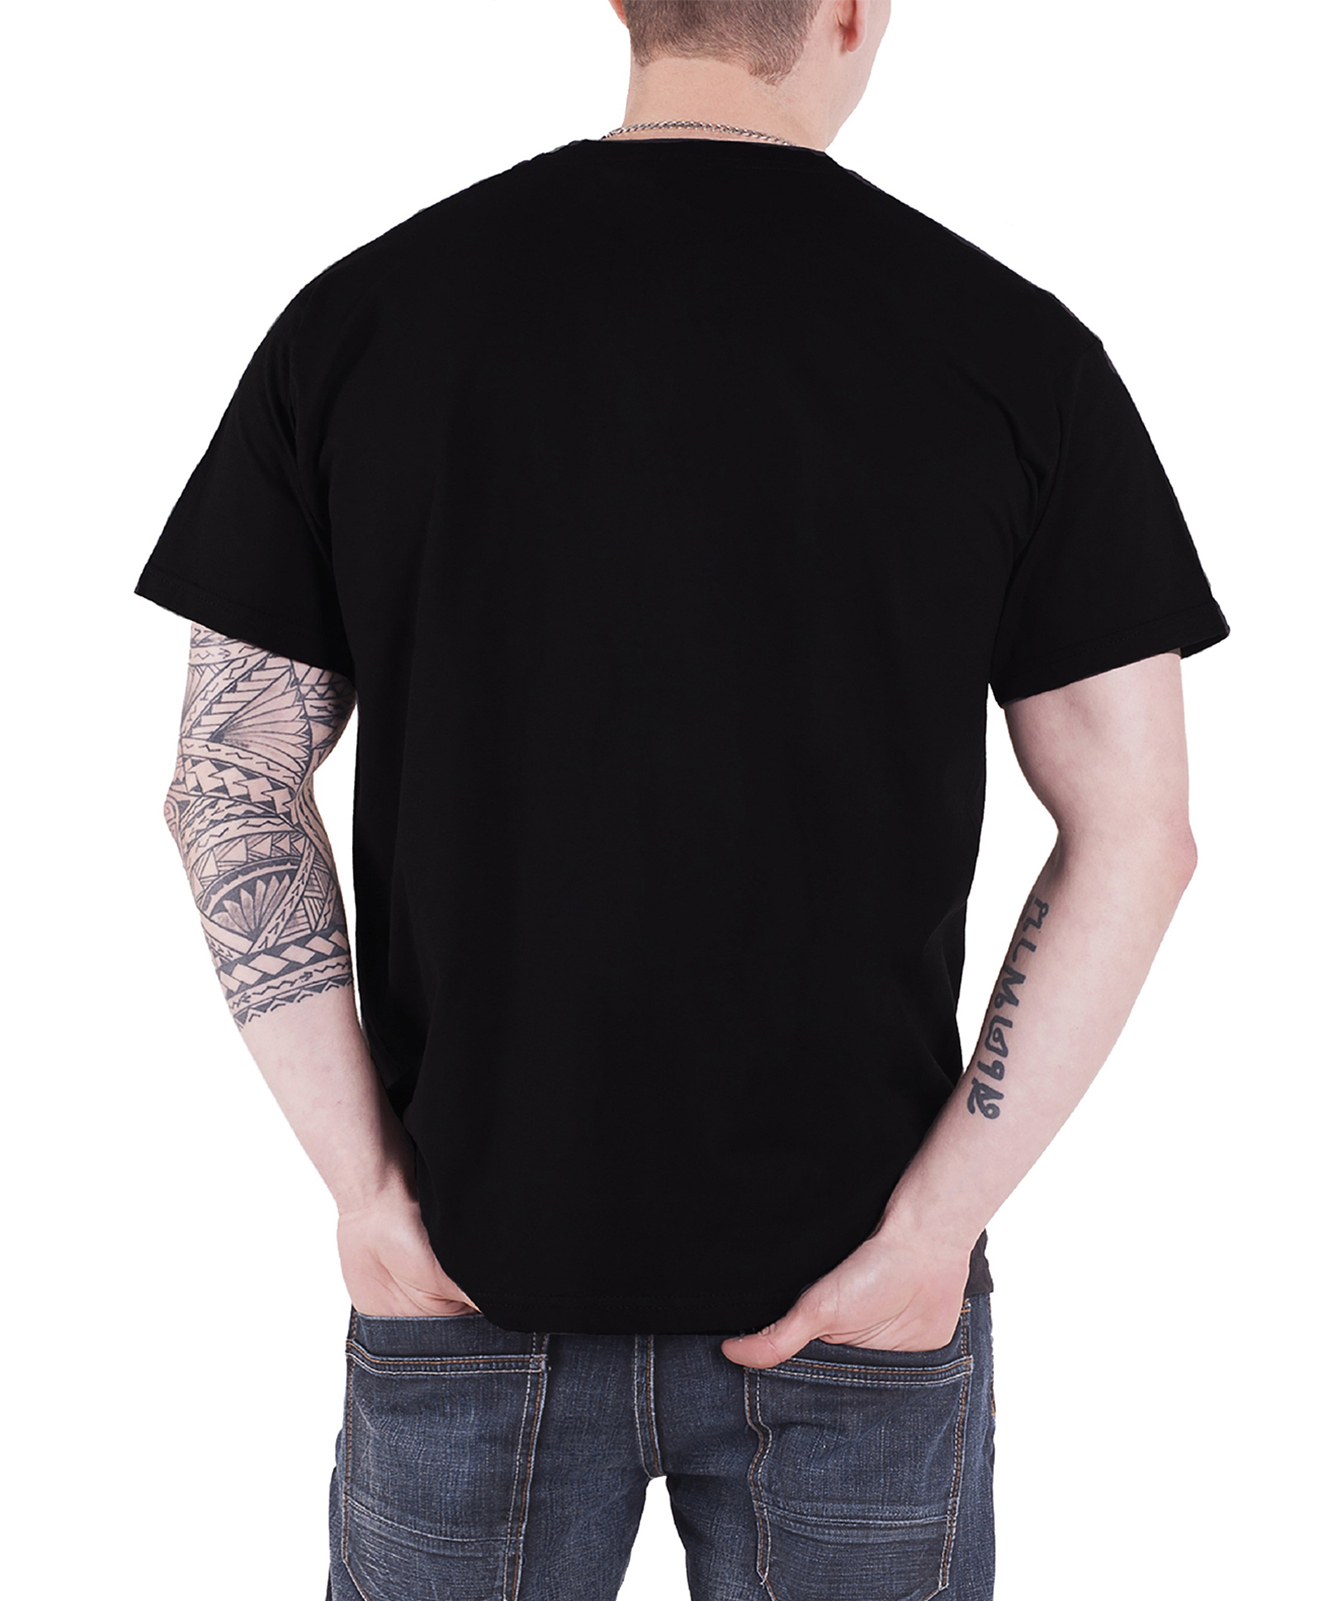 Official-Gas-Monkey-Garage-T-Shirt-Official-GMG-Logo-Kustom-Builds-new-Mens Indexbild 71